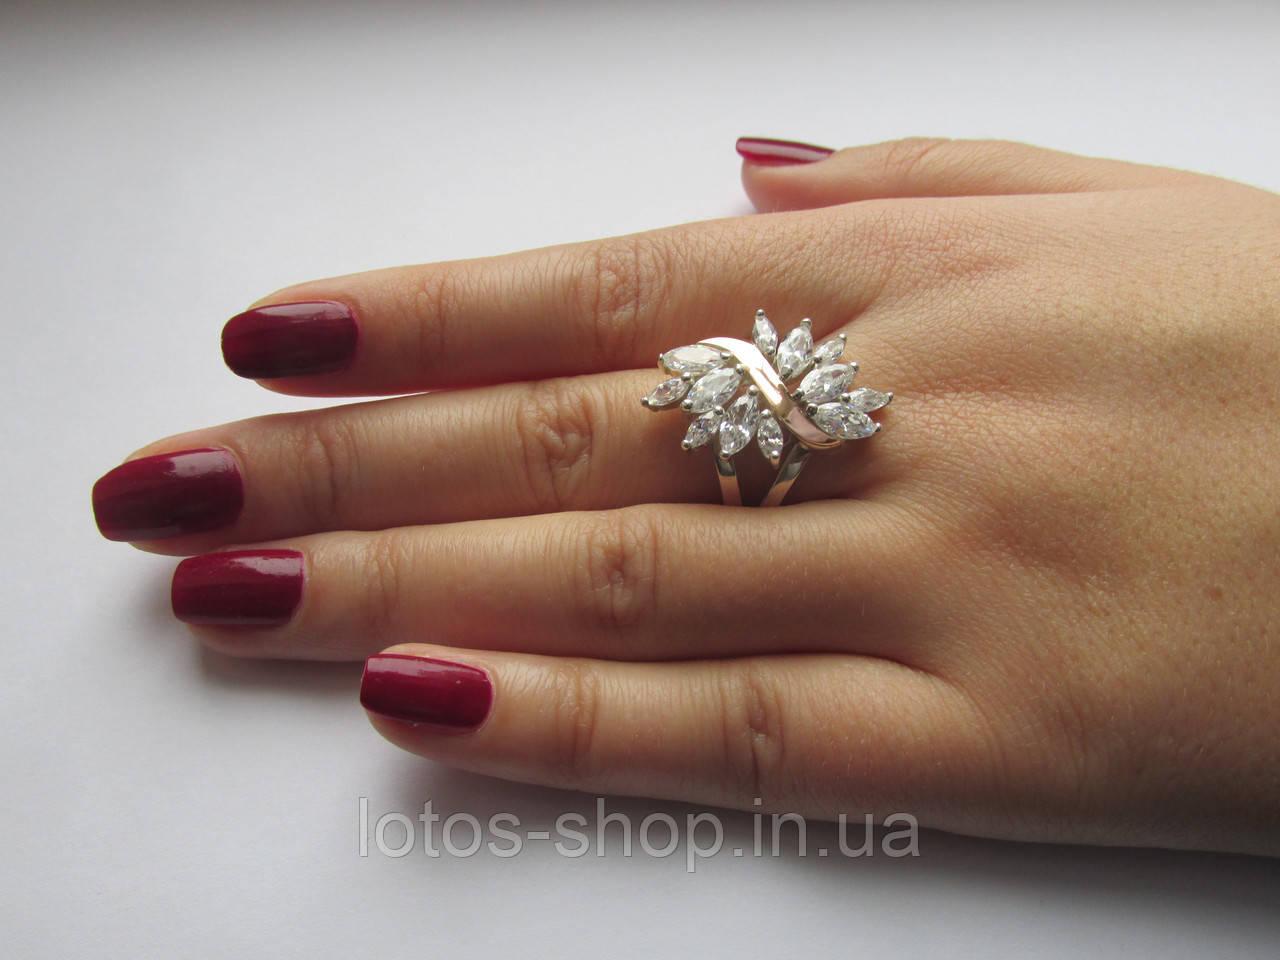 "Серебряное кольцо с золотыми пластинами""Жар-птица"""